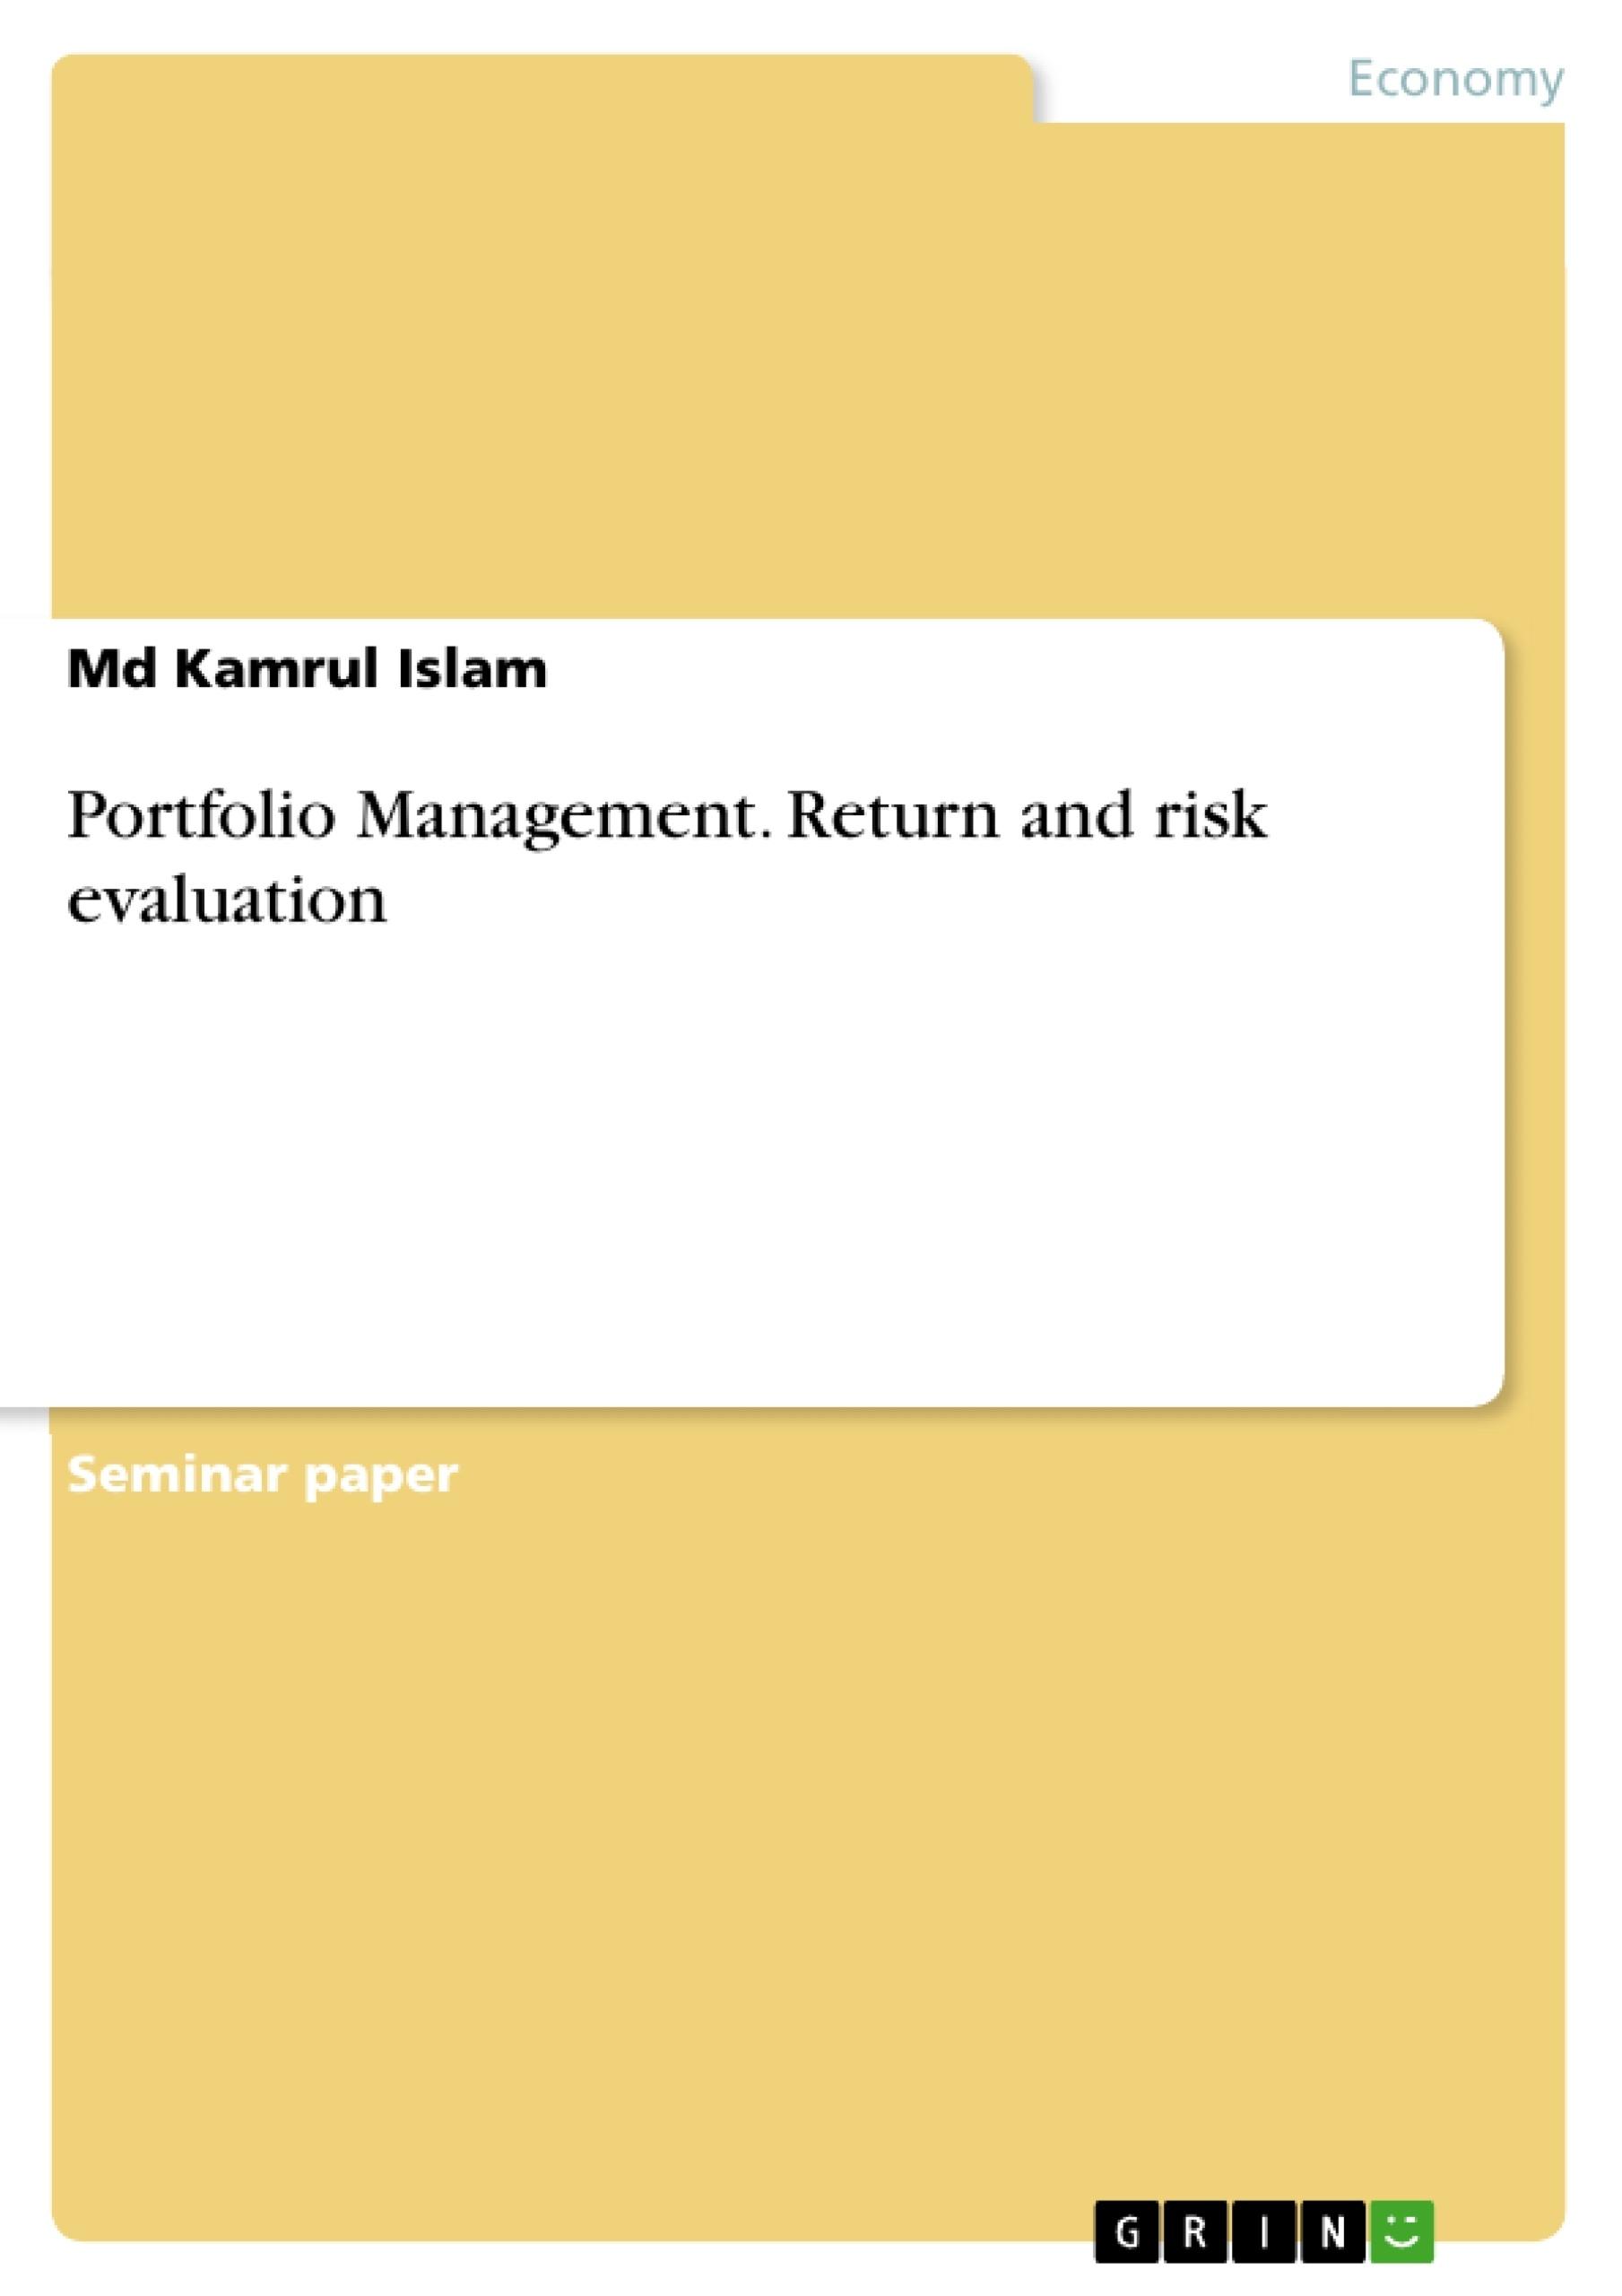 Title: Portfolio Management. Return and risk evaluation